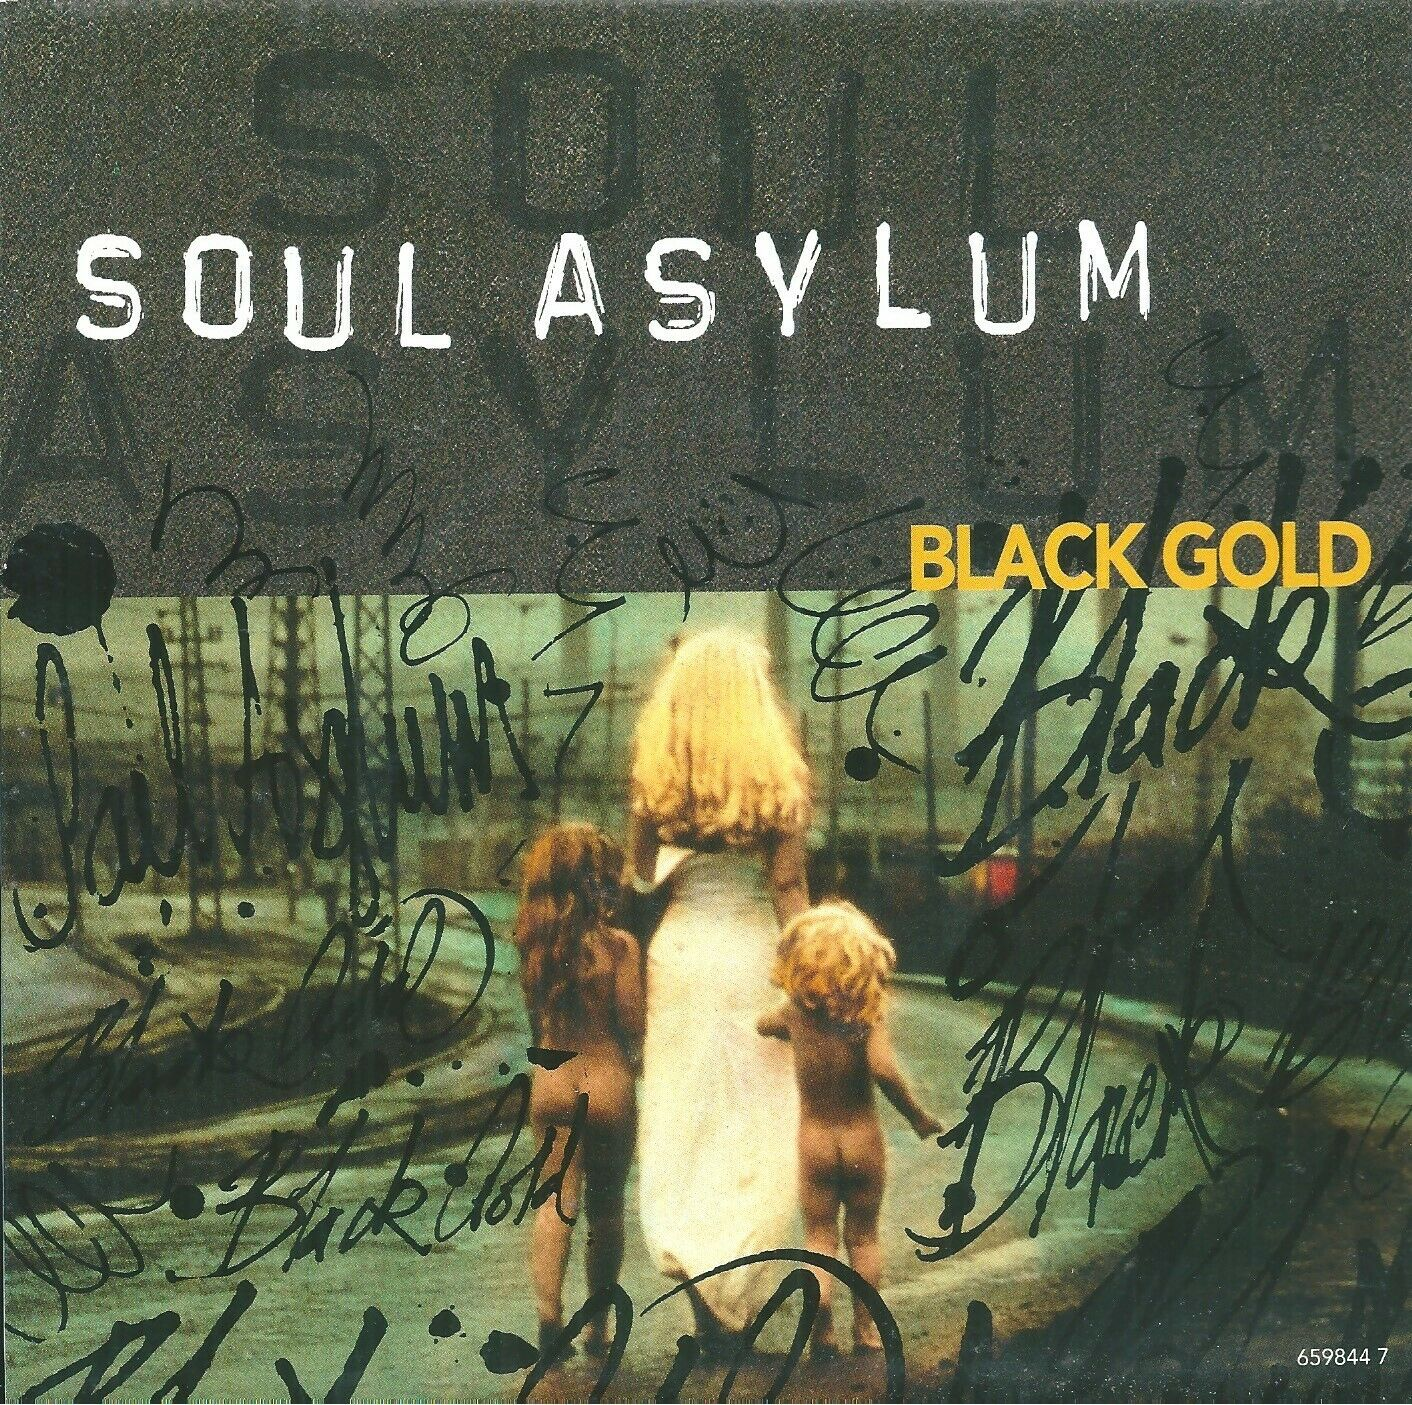 "Soul Asylum – Black Gold Vinyl 7"" P/S Single UK Columbia 659844 7 1993 Ex"